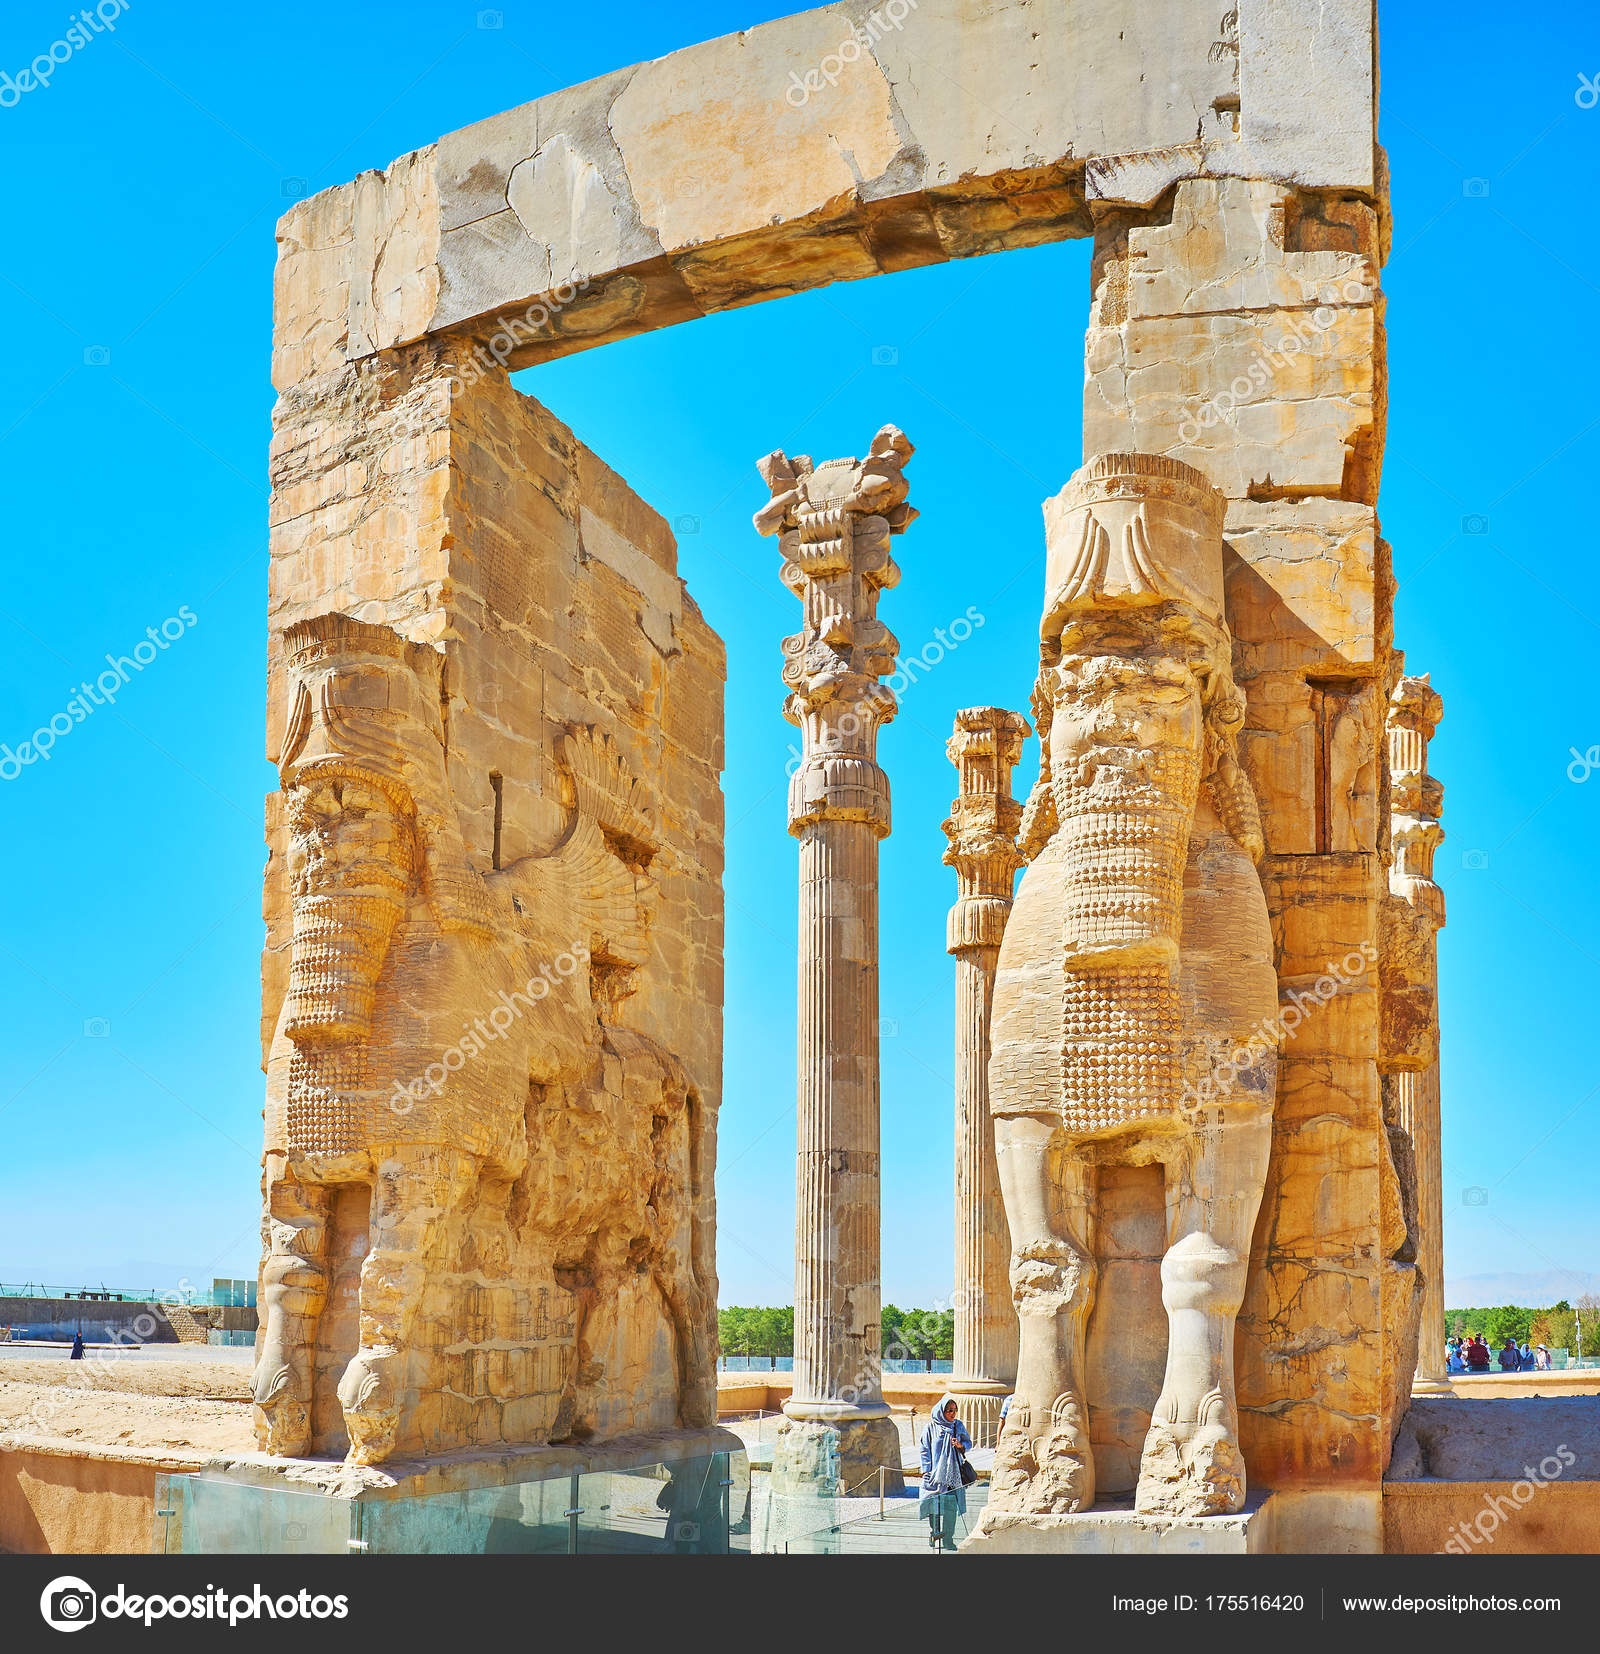 Architecture Of Persepolis Iran Stock Editorial Photo C Efesenko 175516420